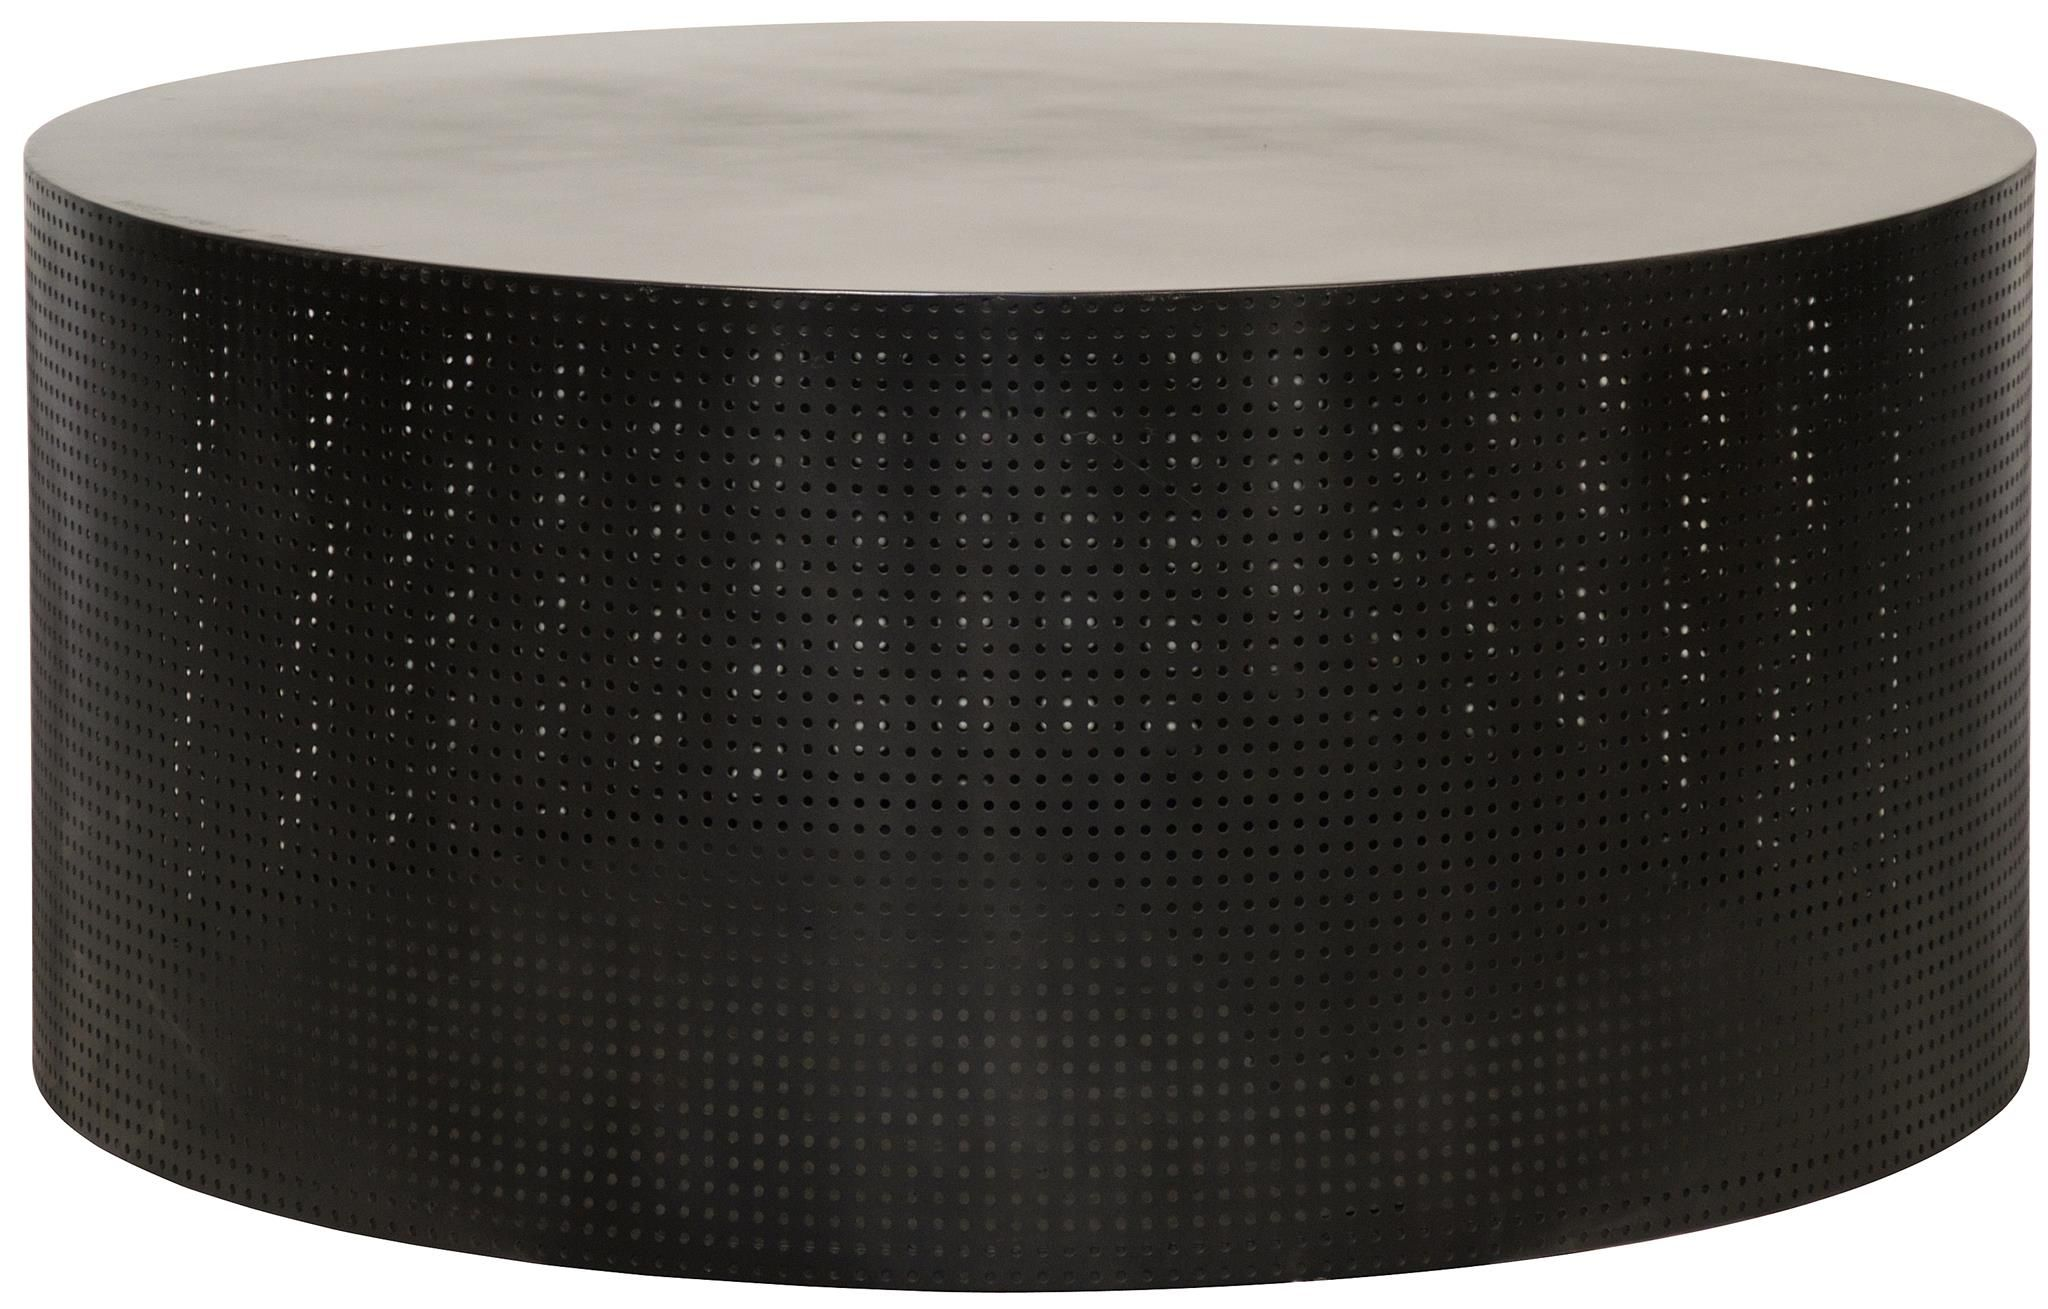 "Dixon Table 40"" diam Marble round coffee table, Drum"